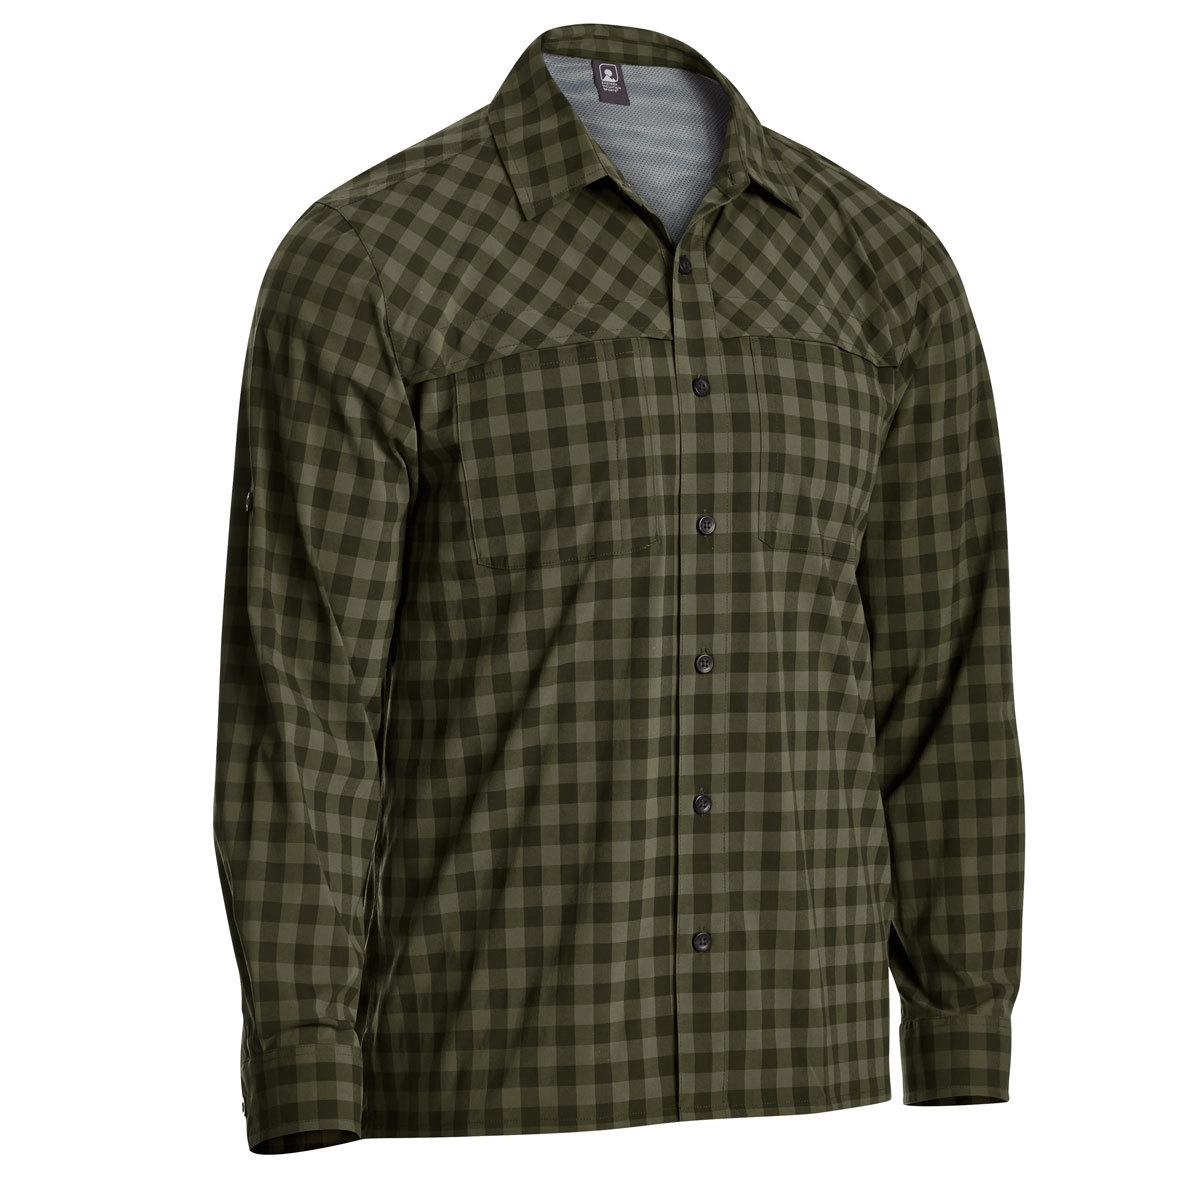 Ems Men's Journey Plaid Long-Sleeve Shirt - Green, S